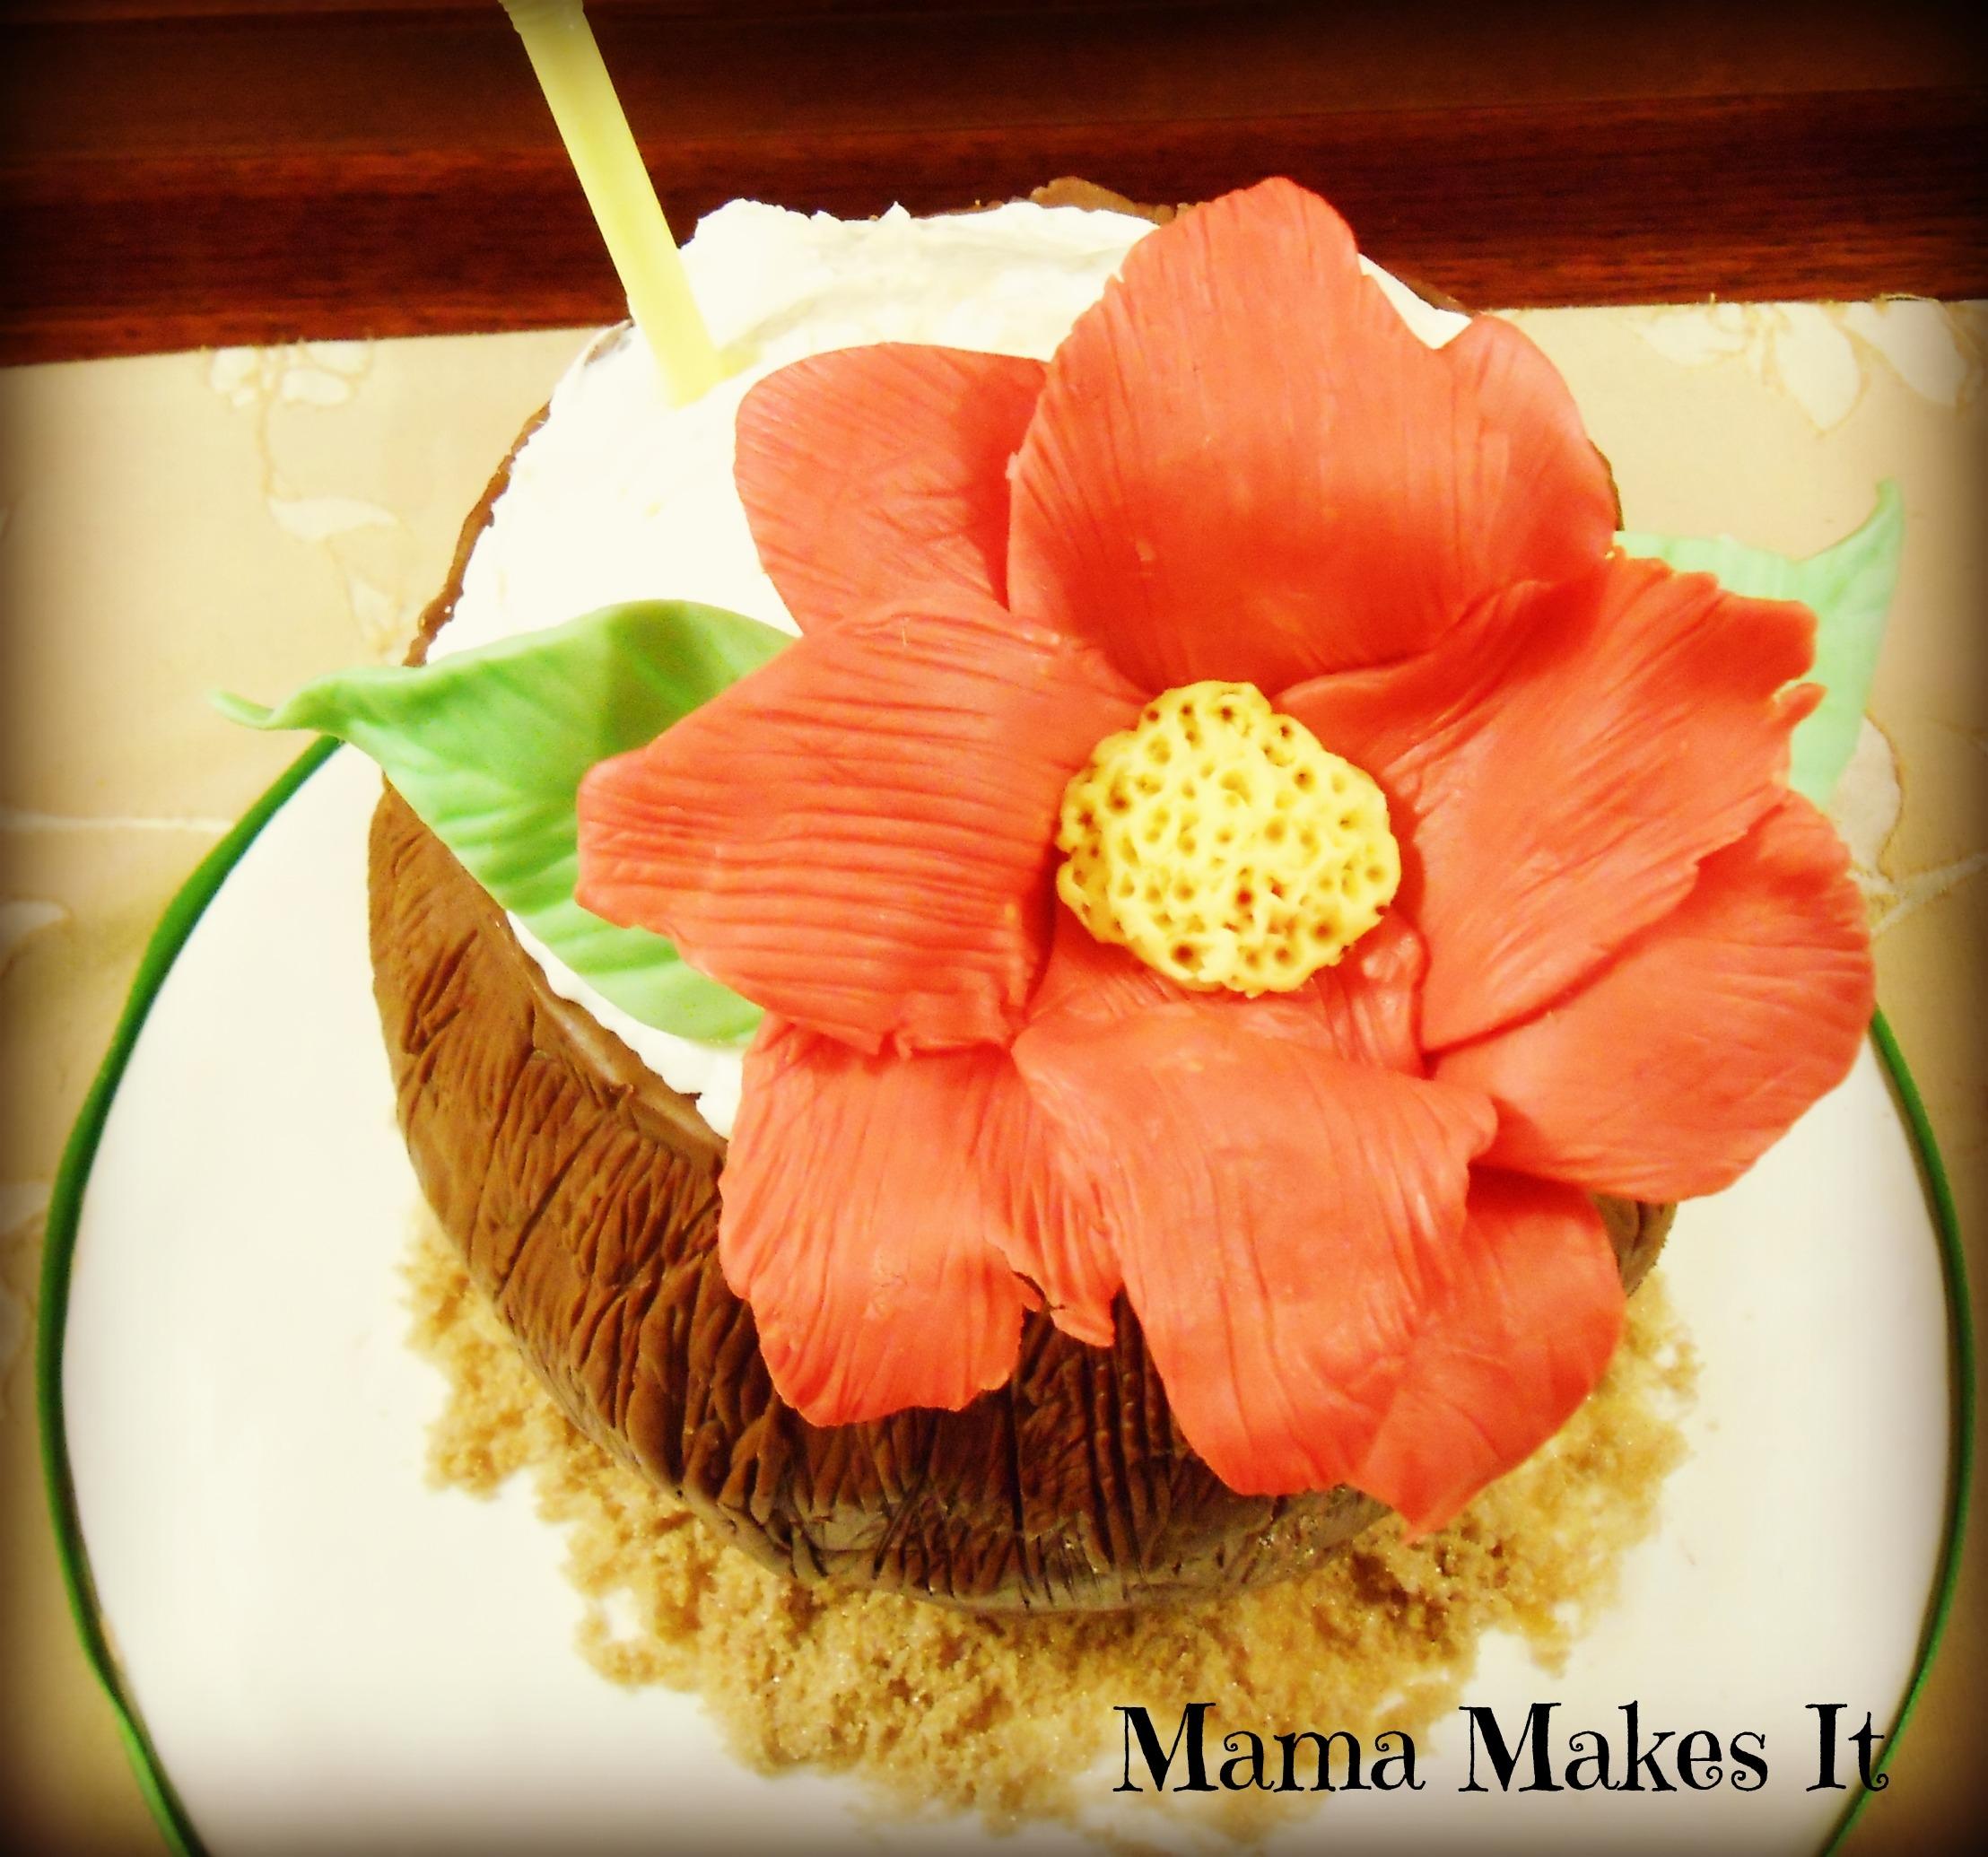 Recent Magazine With Recipe For Almond Joy Cake